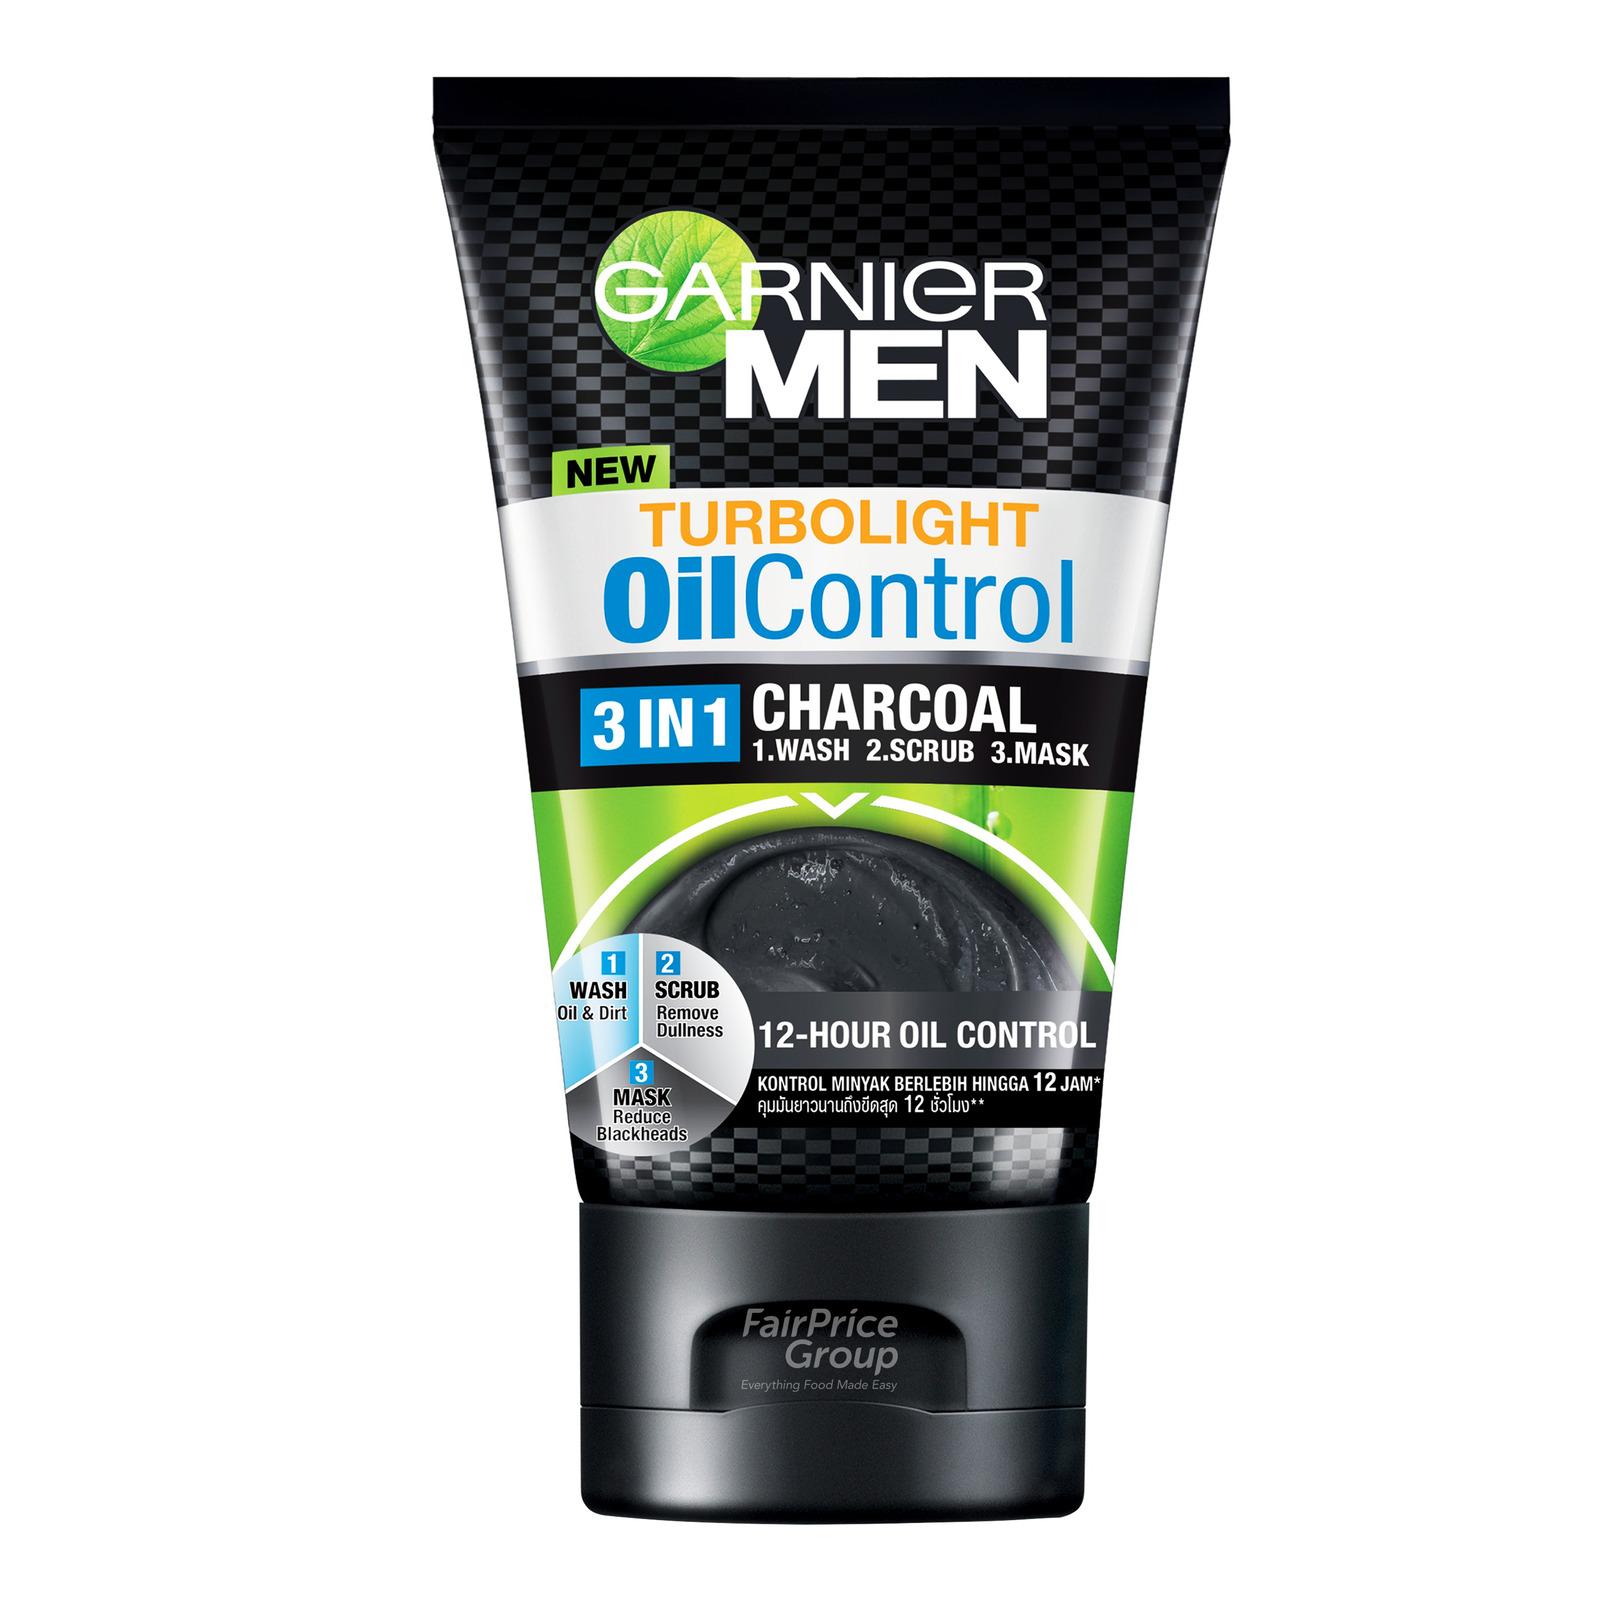 Garnier Men TurboLight Oil Control Anti-Shine Brightening Cooling Foam, 100ml